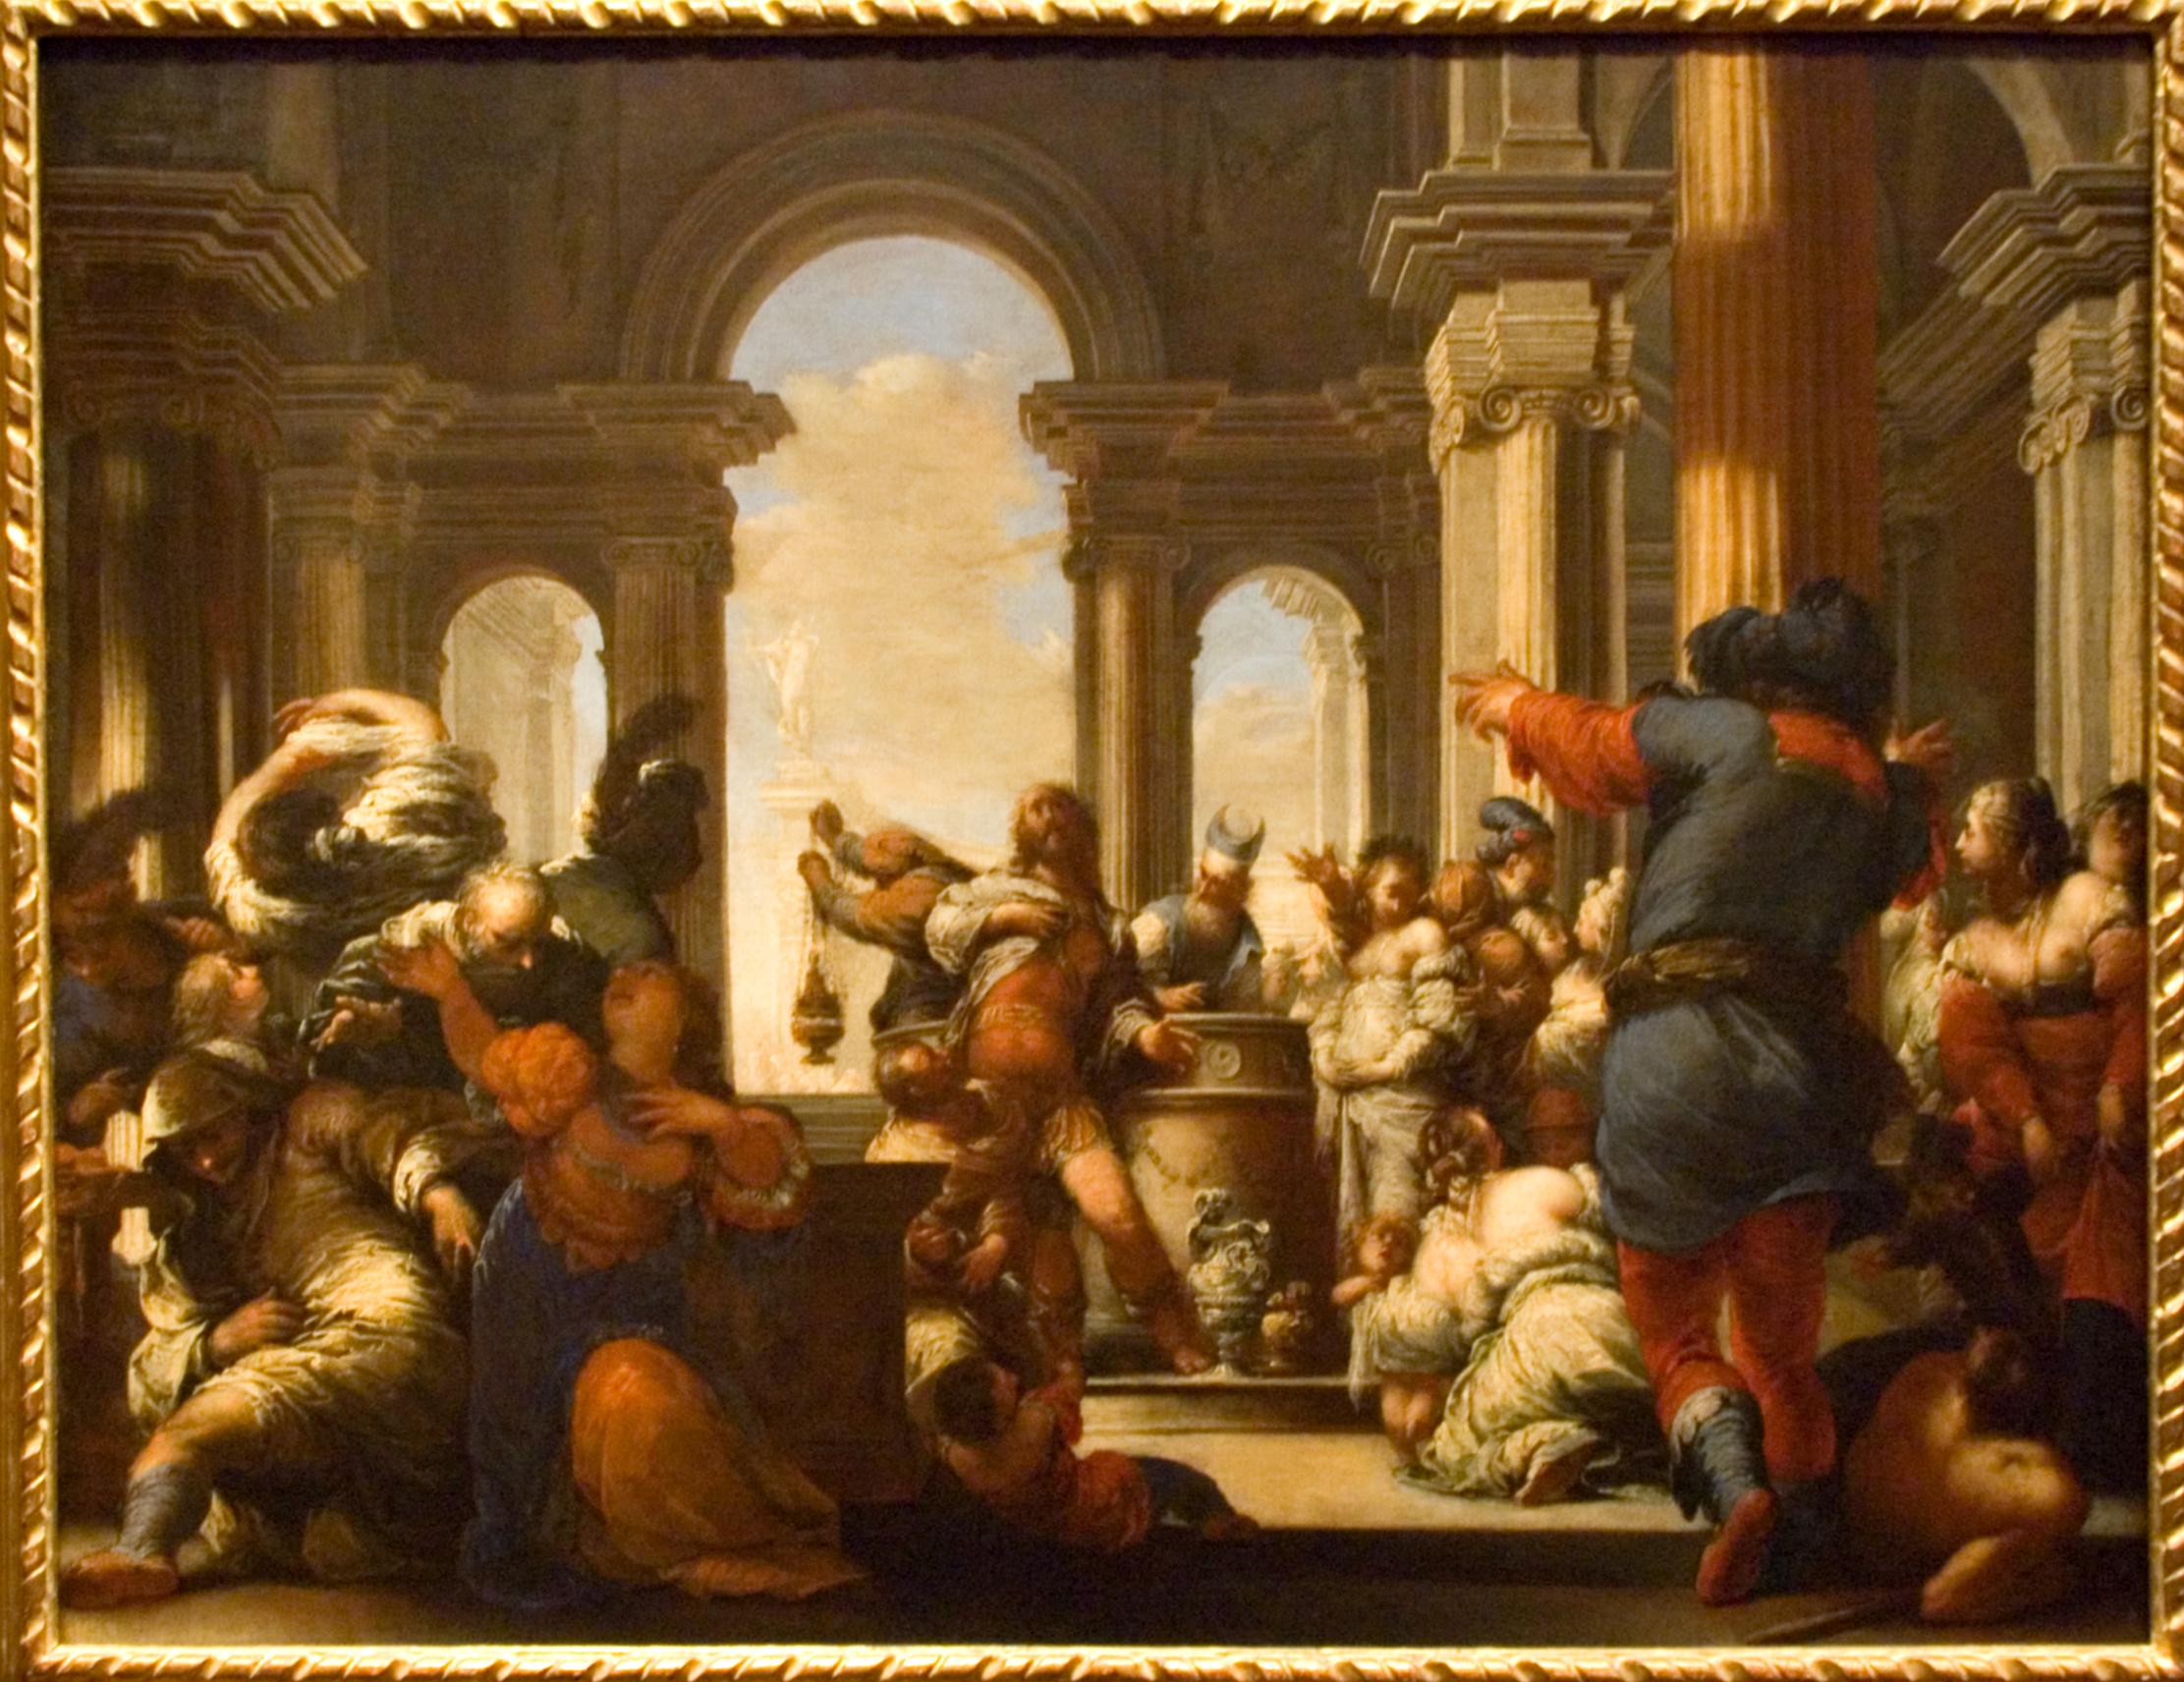 Italian Baroque Painter Caravaggio Used A Technique Called Tenebrism